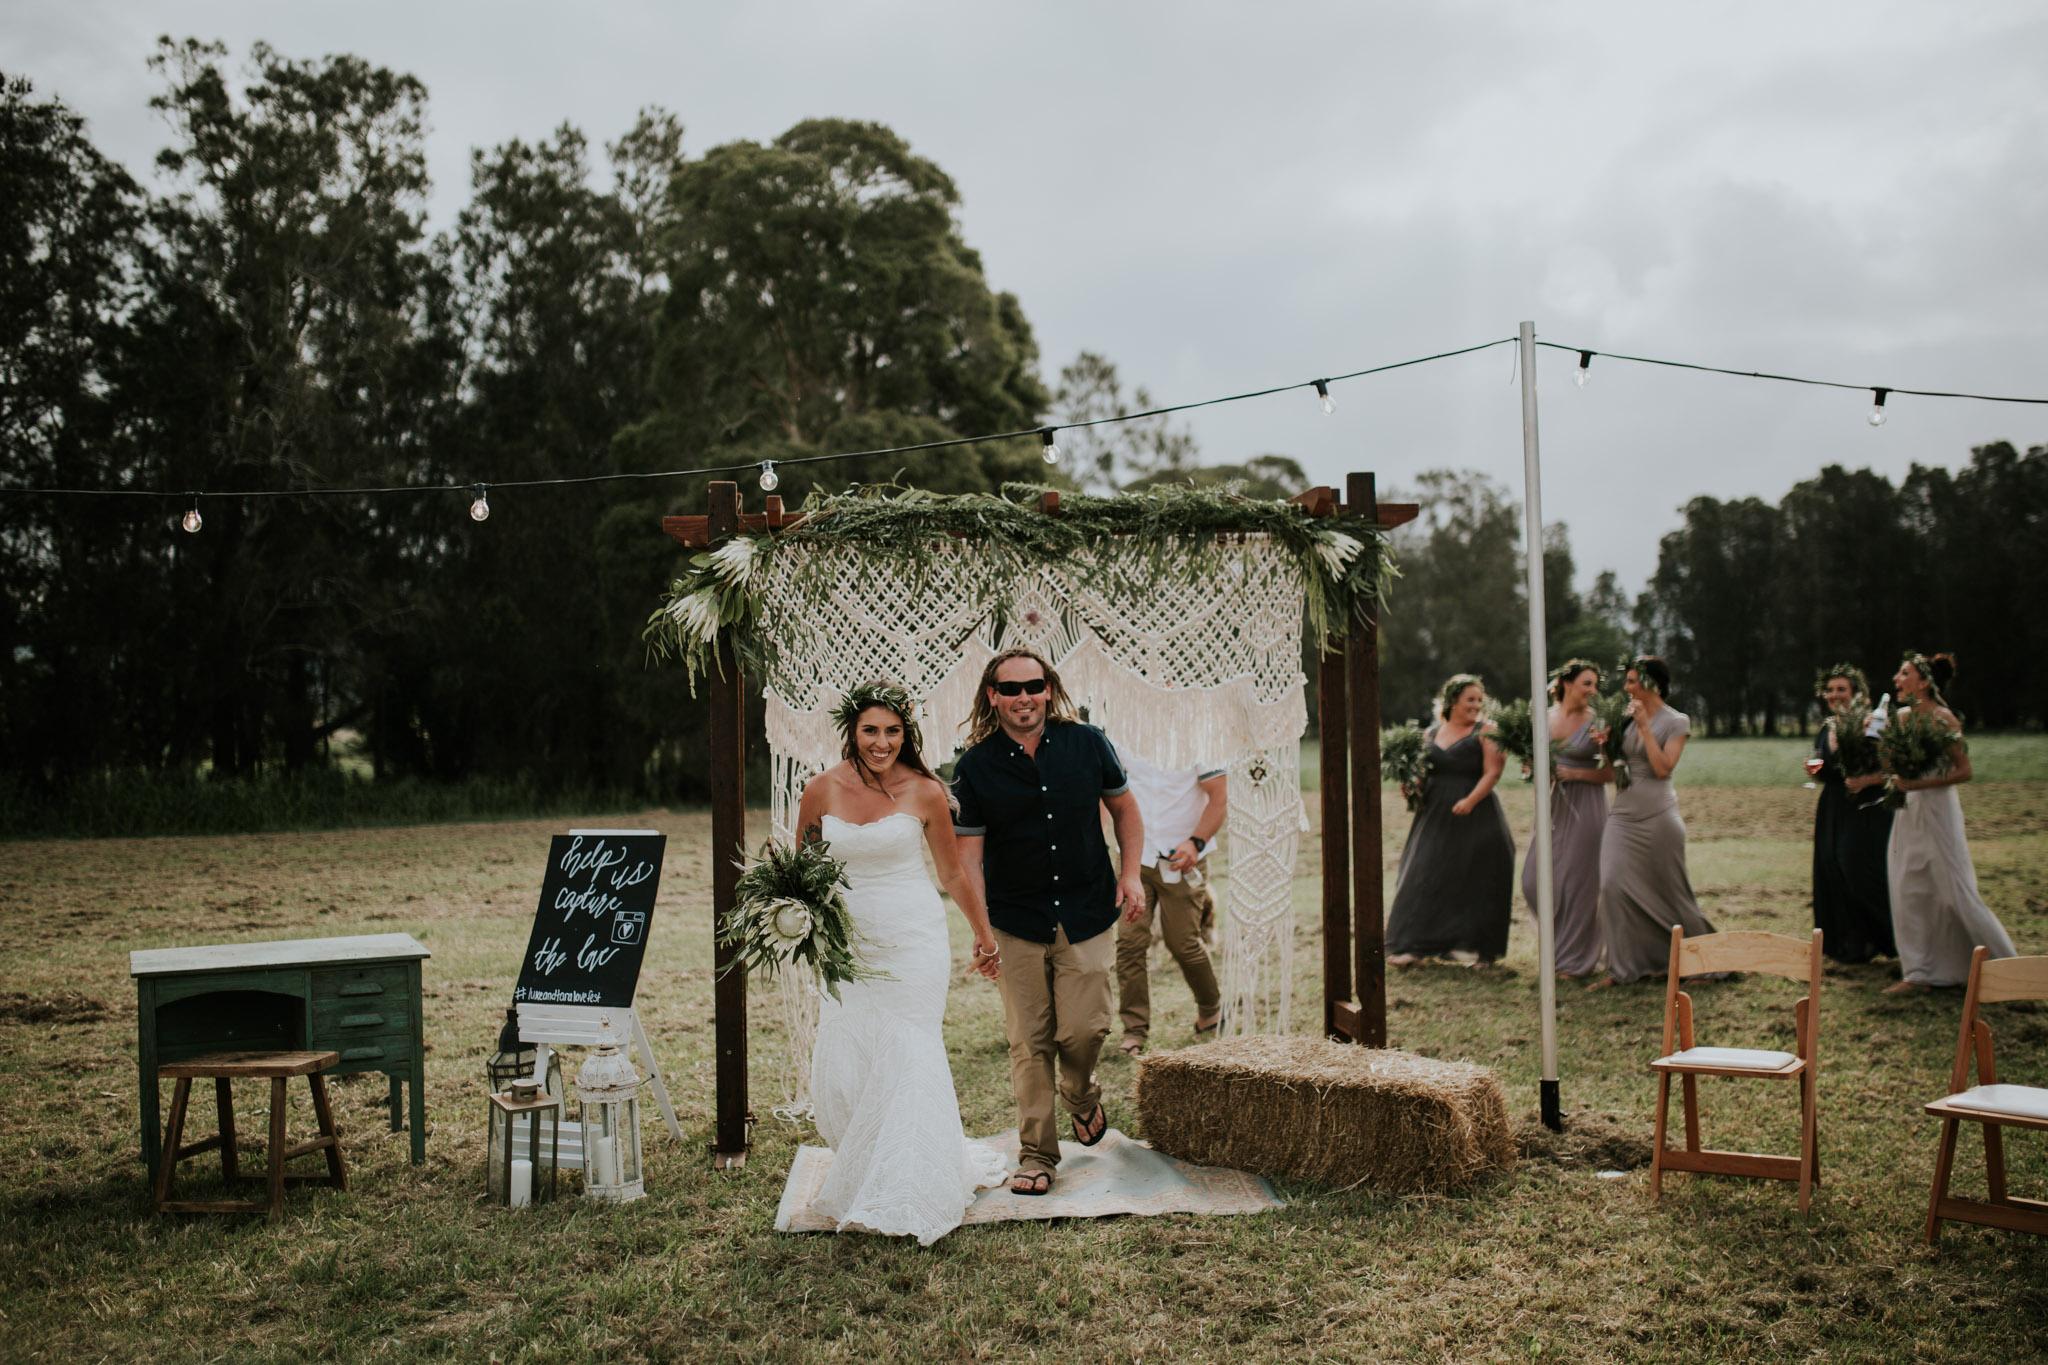 Tara_Luke_Jamberoo_Honey_farm_wedding-114.jpg